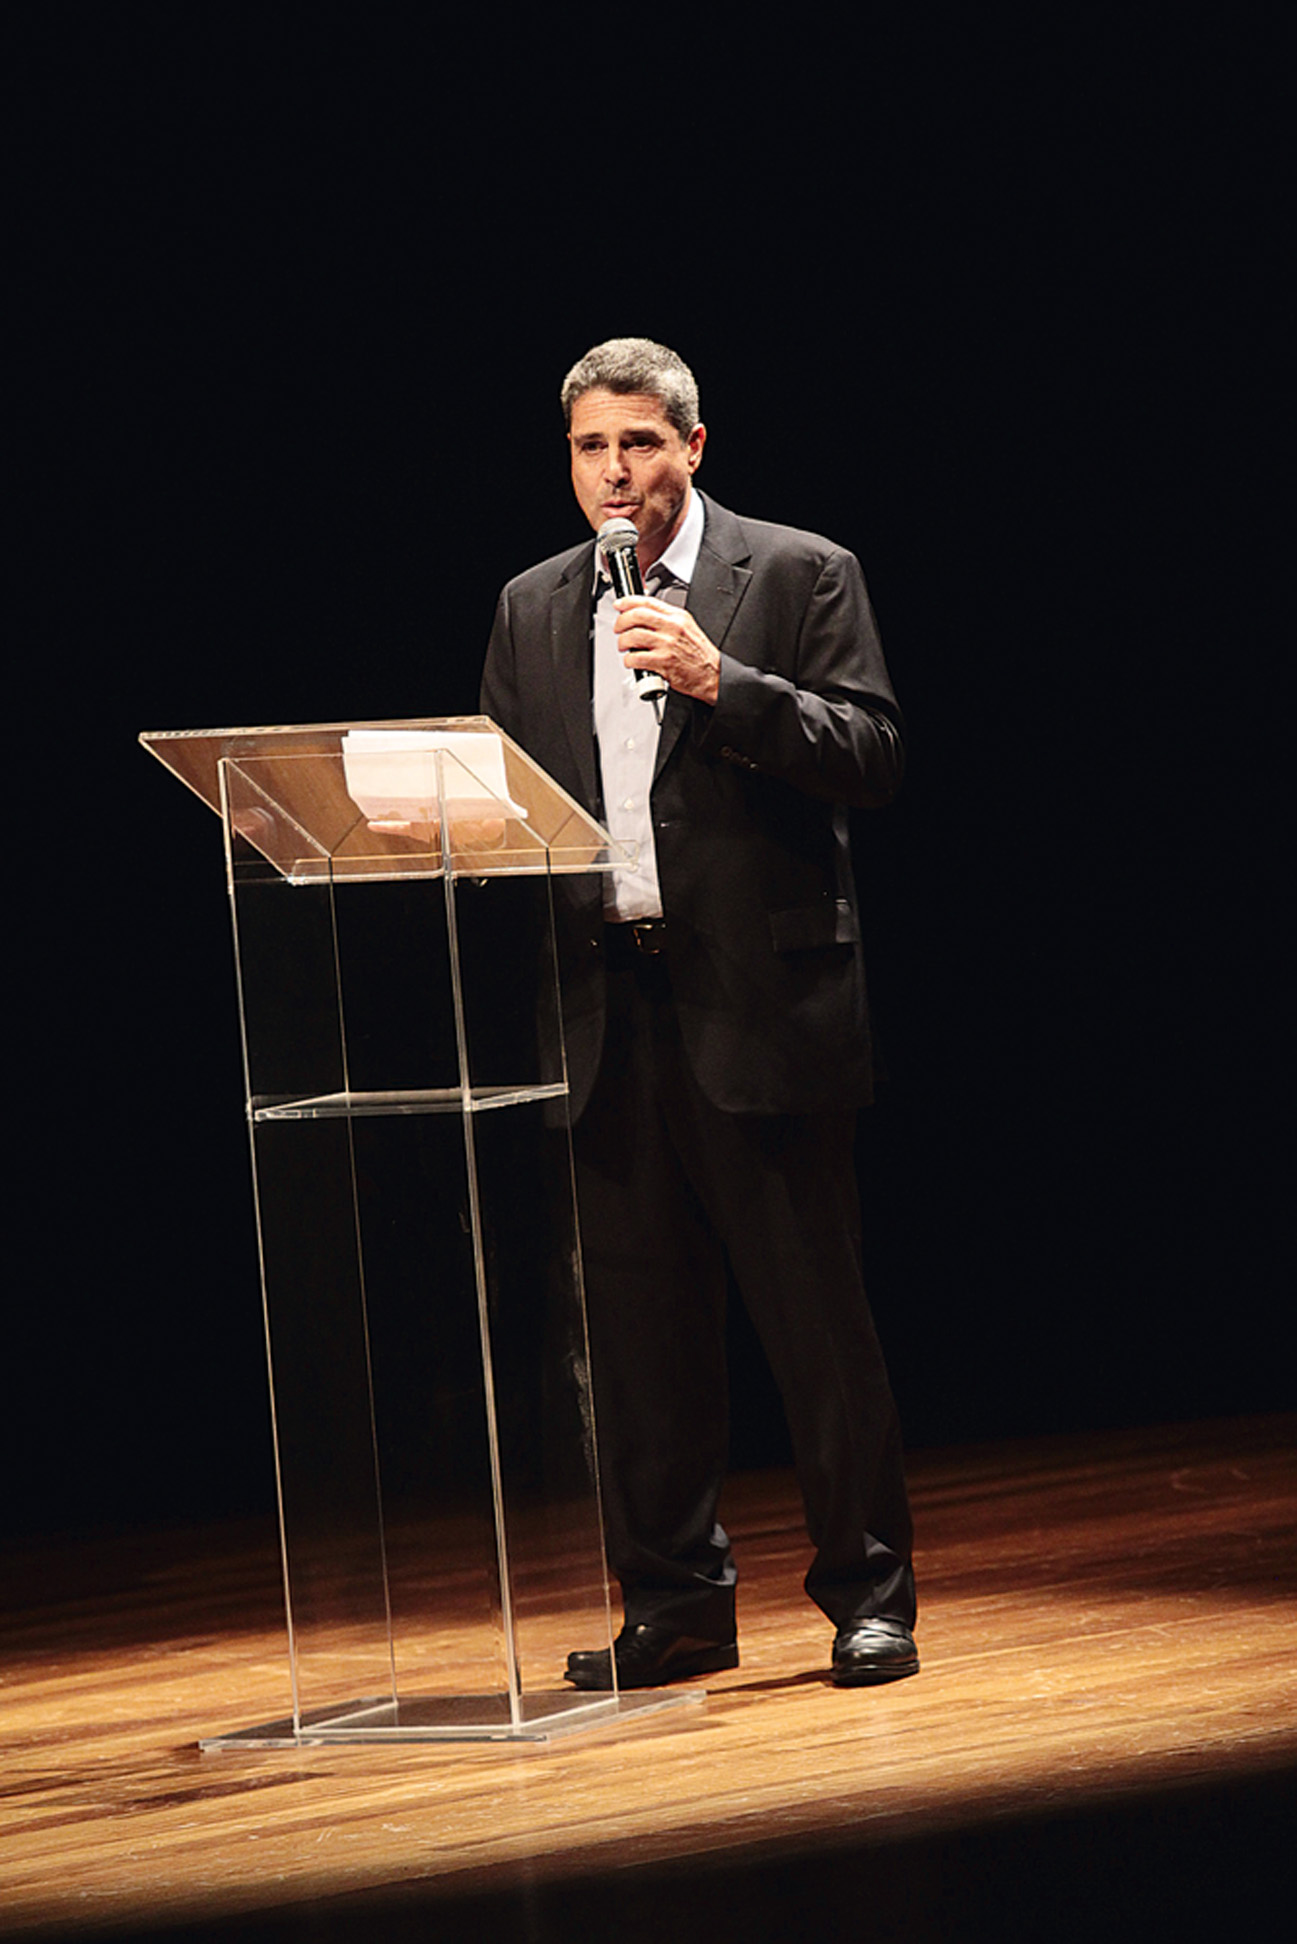 David Feffer, do grupo Suzano, fala à plateia